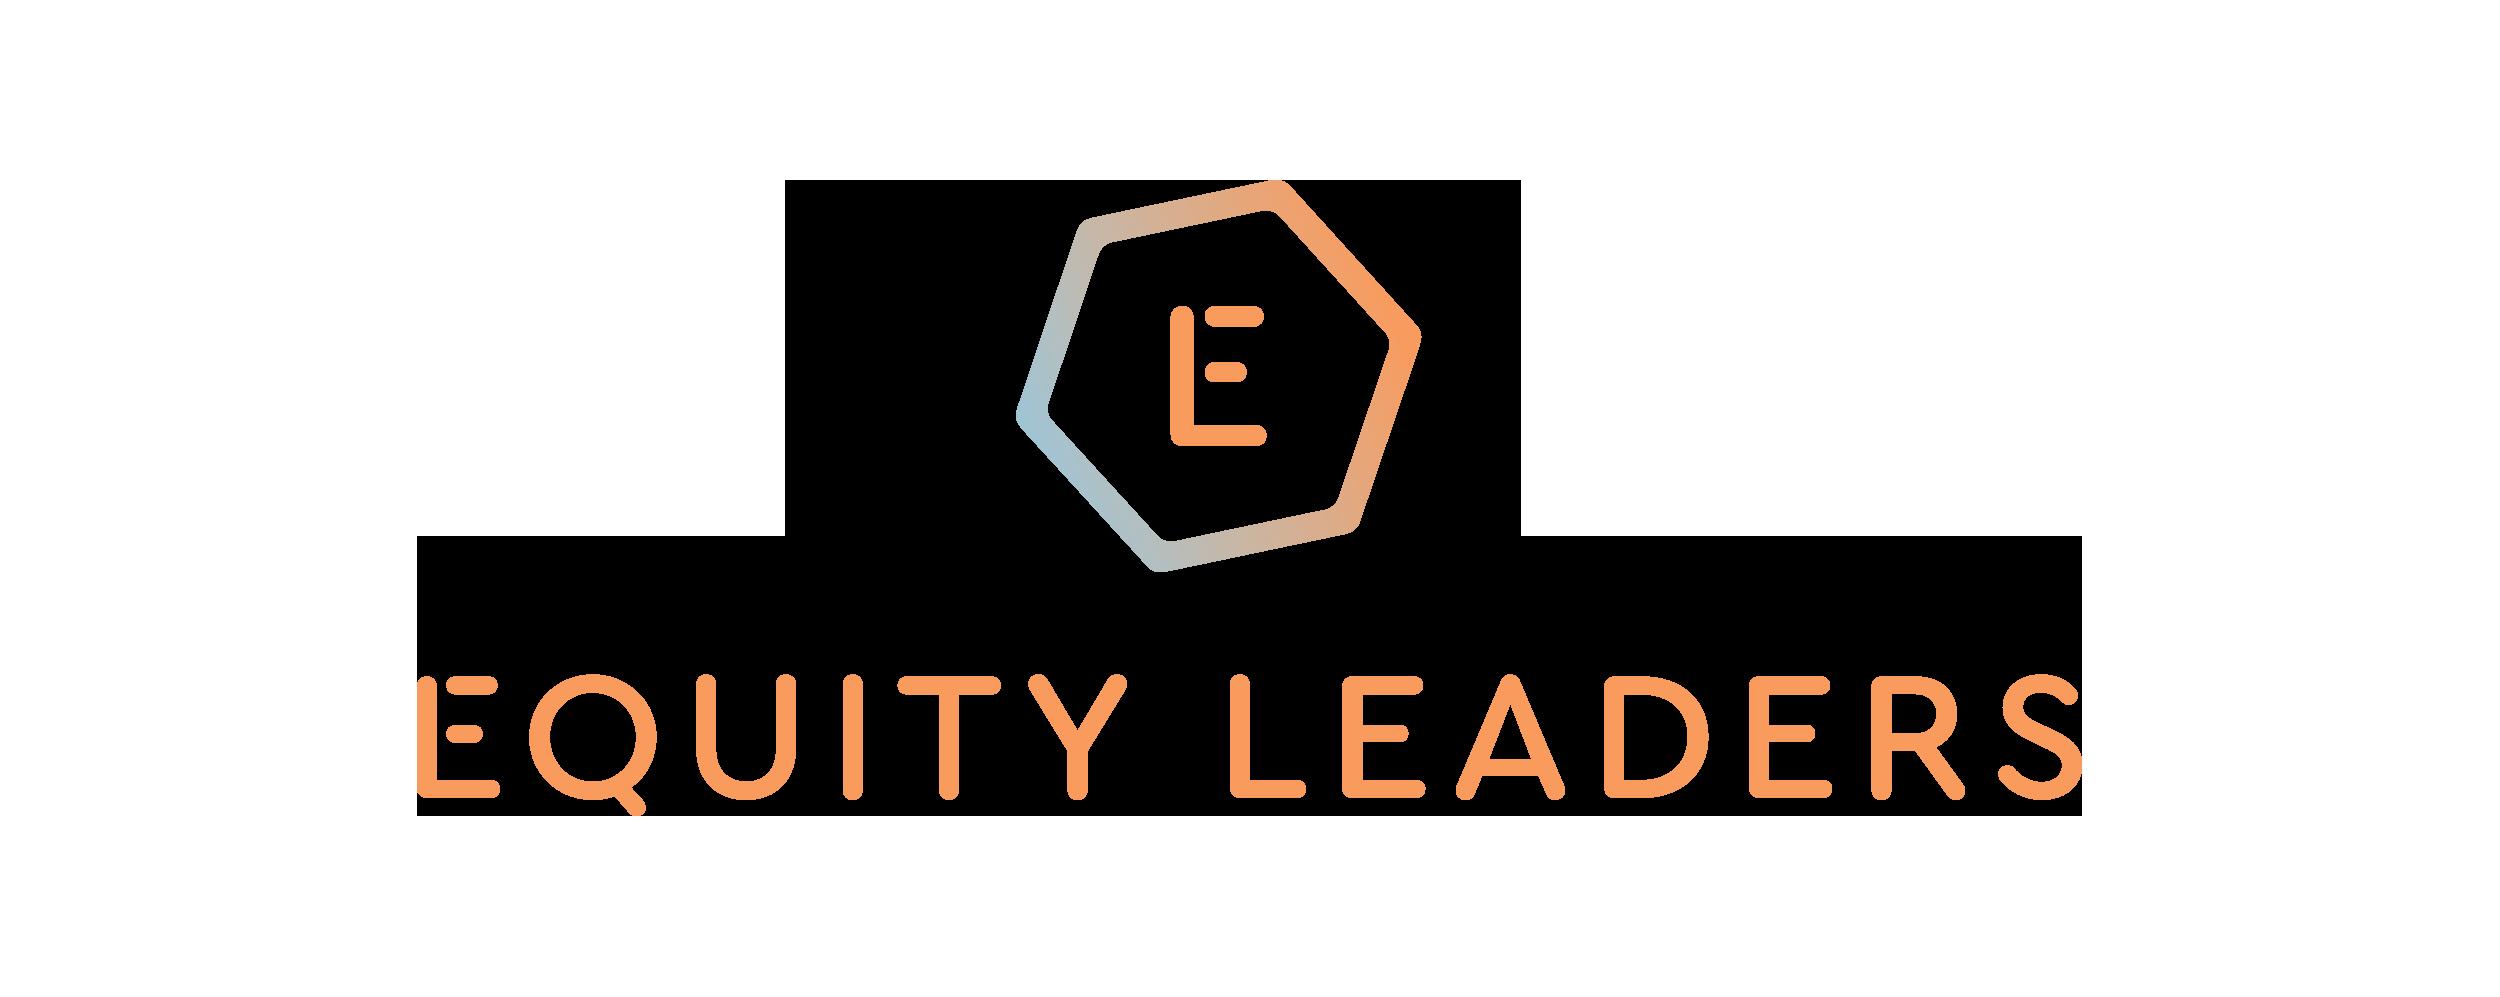 equityleaders-logo-1.png